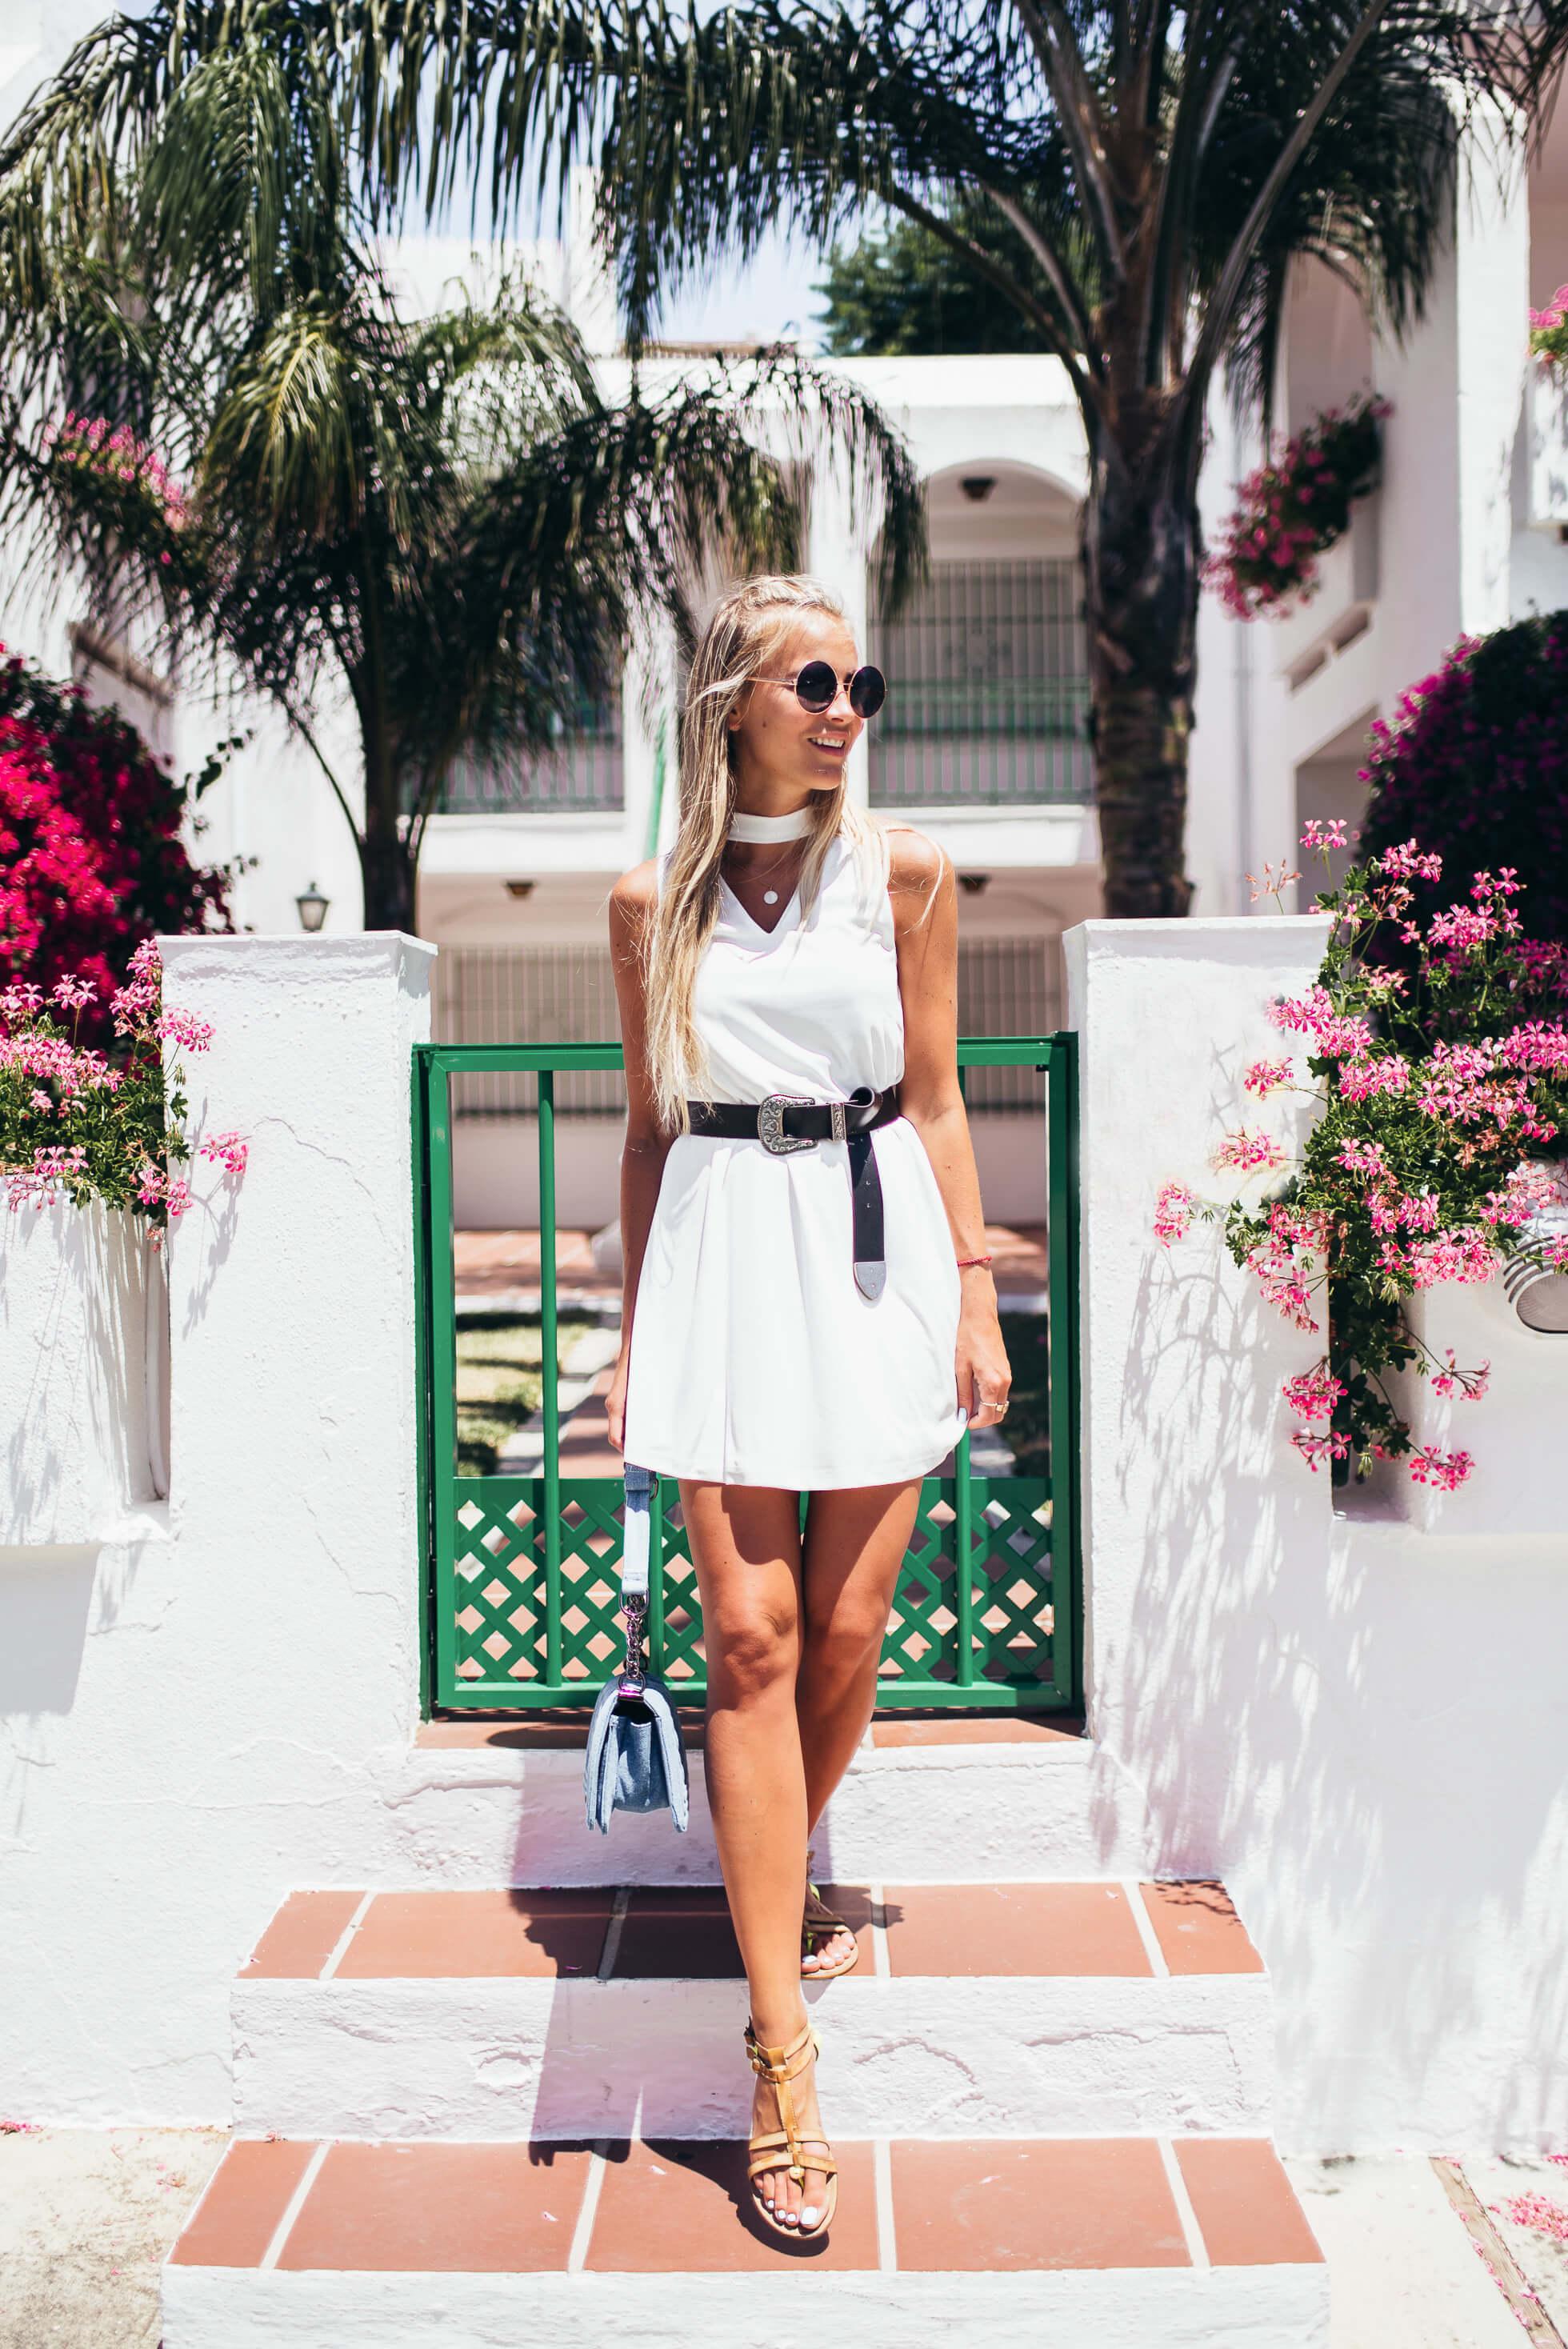 janni-deler-perfect-white-dressDSC_7820-Redigera